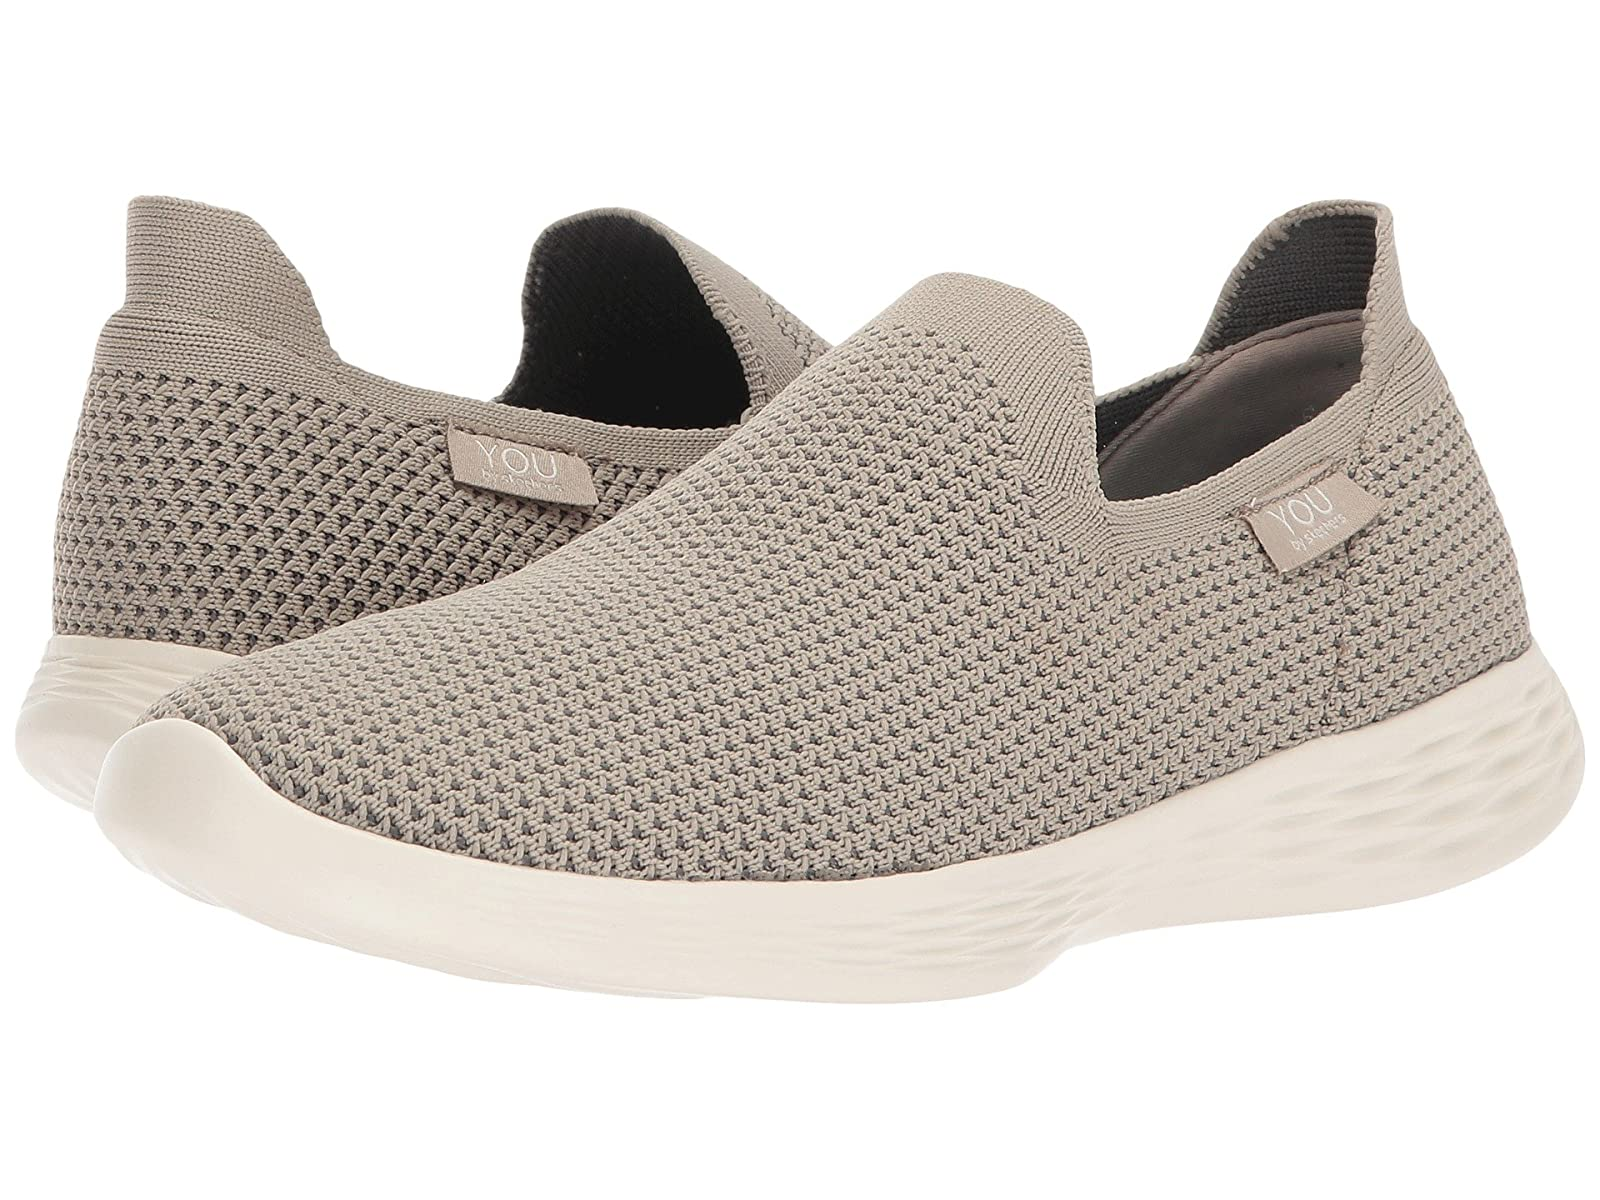 SKECHERS Performance You - ZenAtmospheric grades have affordable shoes